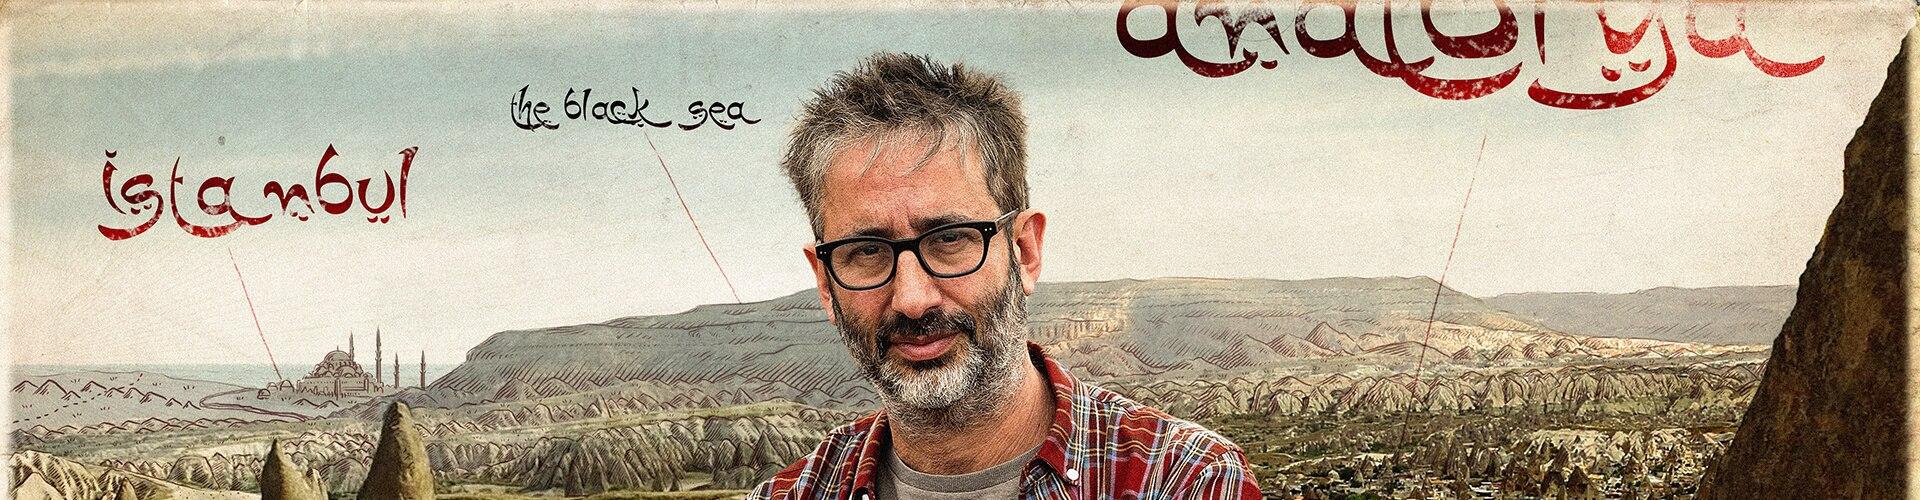 Watch David Baddiel on the Silk Road Online